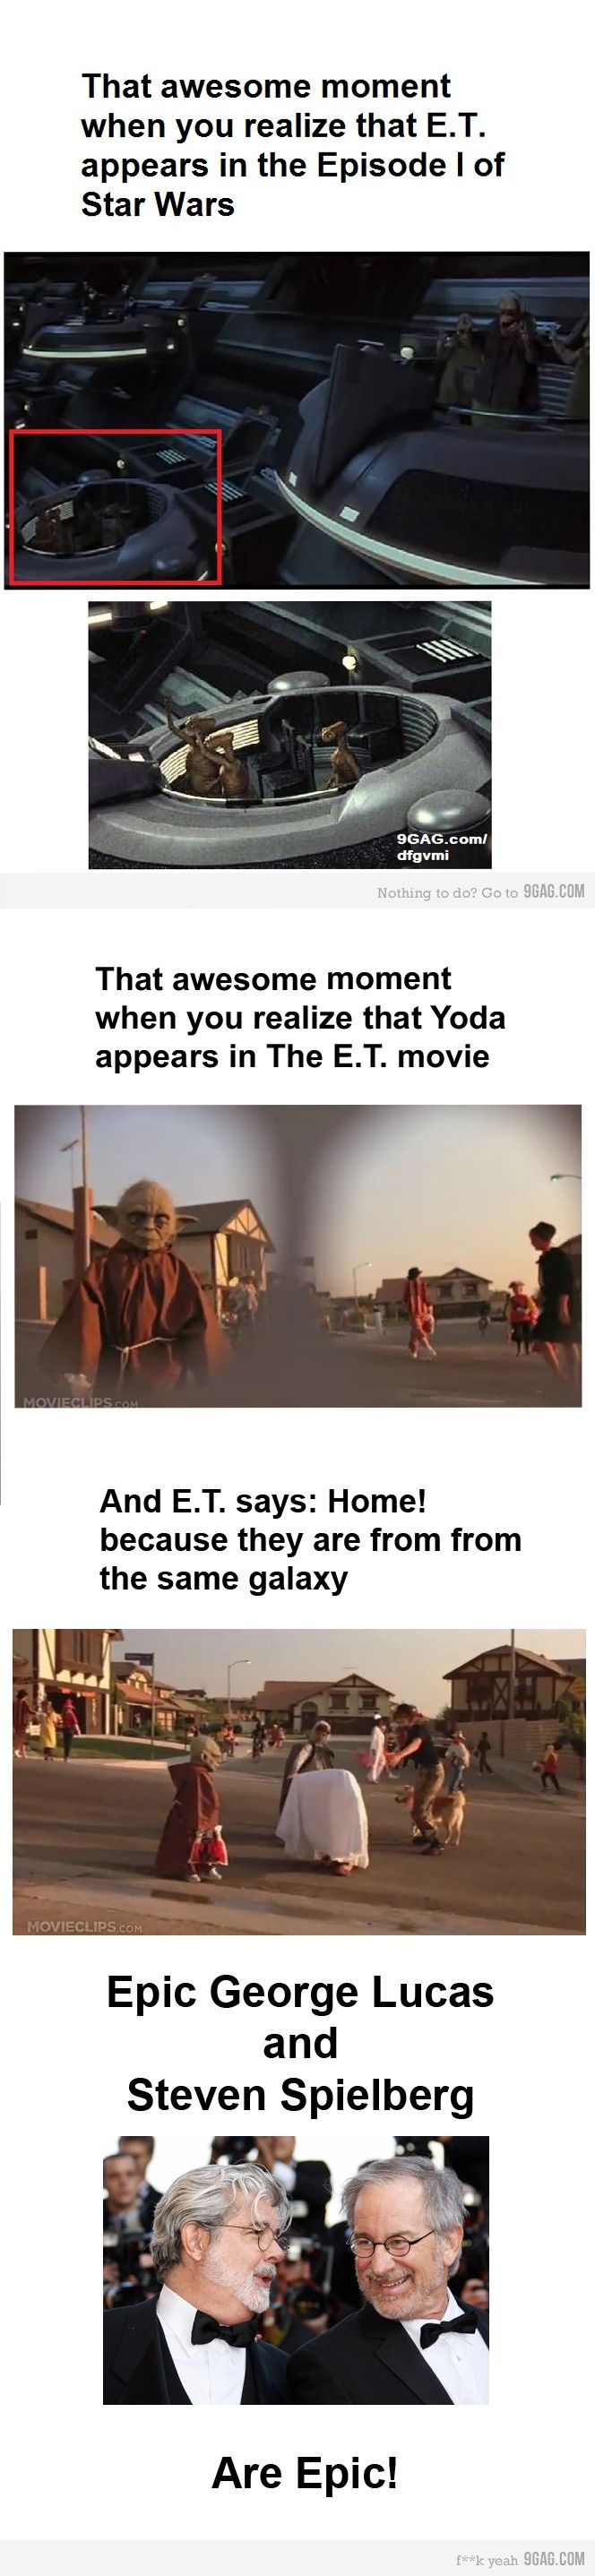 ET/Yoda: Mind Blown, Mindblown, This Is Awesome, Steven Spielberg, Stars War, Funny, Movie, George Lucas, Starwars